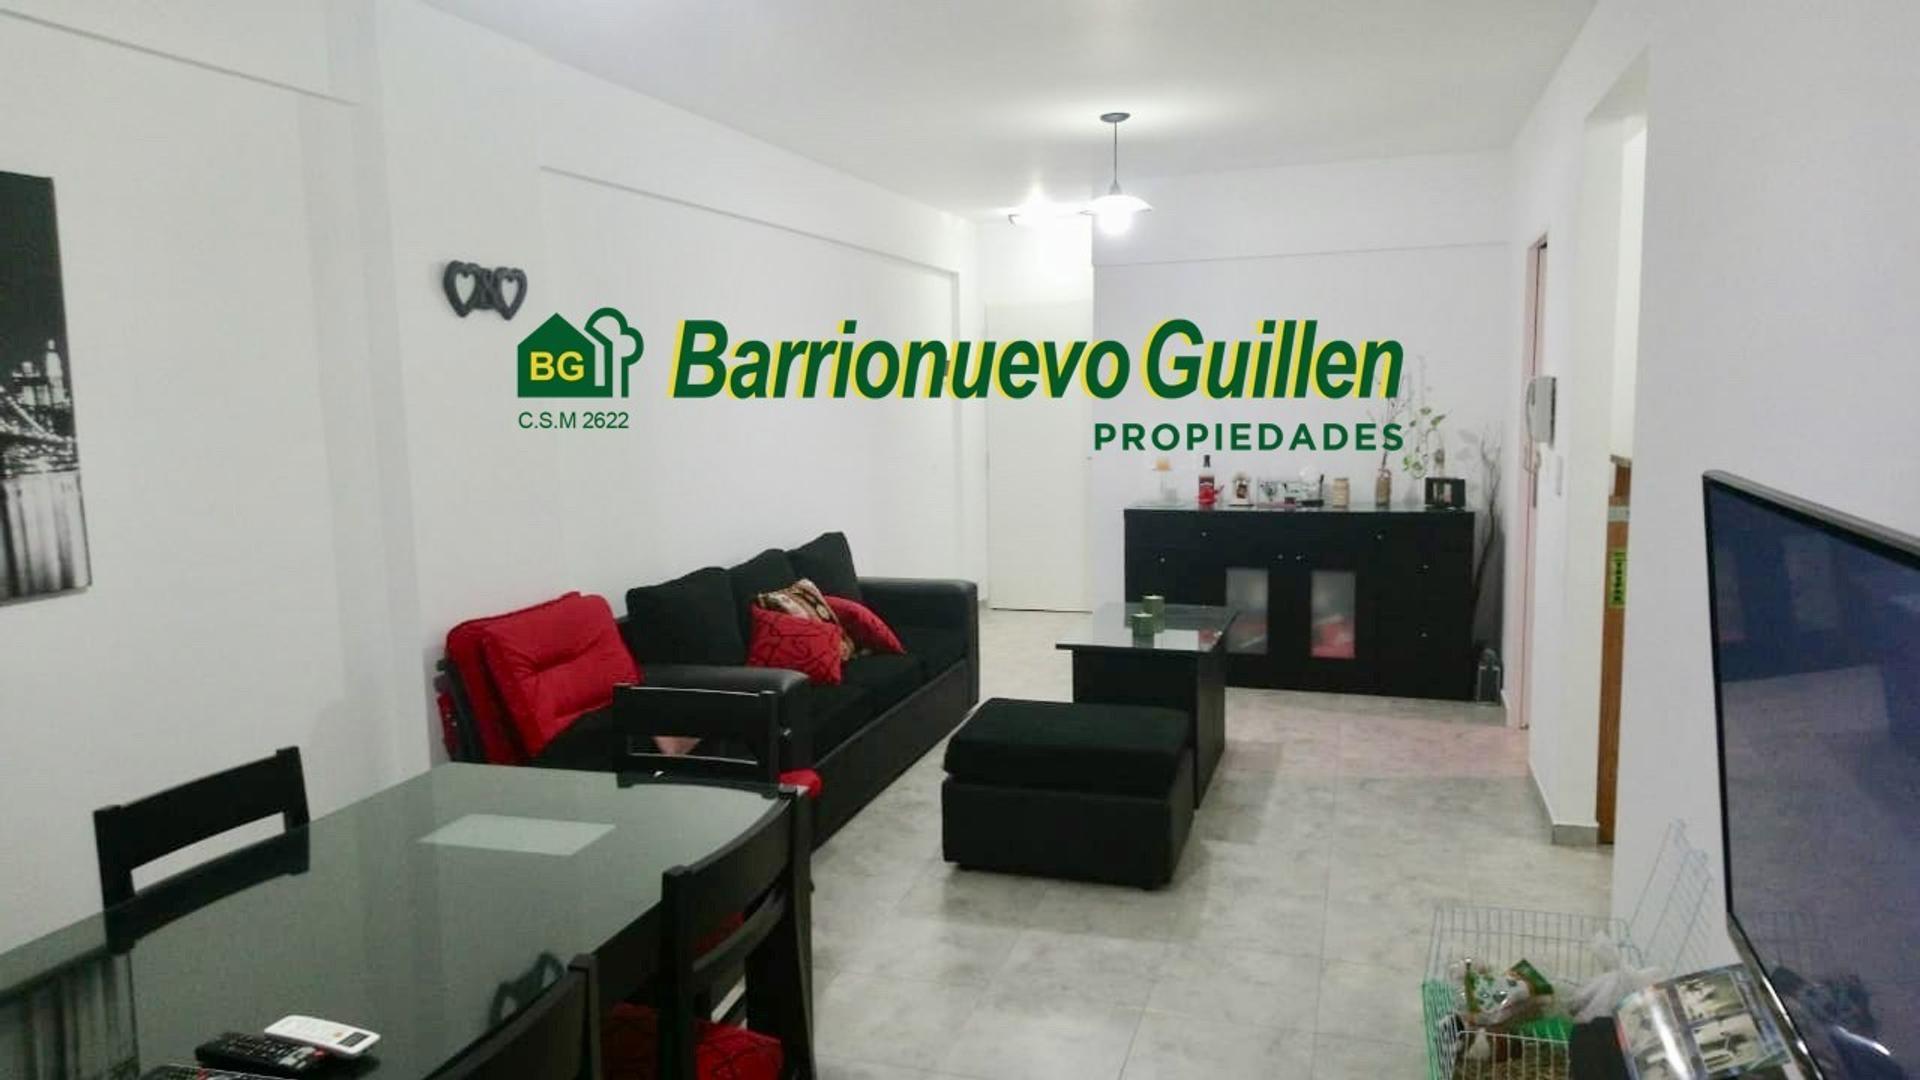 Unico Depto. 2 Amb. 57 m² con Balcon en Bonifacini 4844 - Caseros Norte